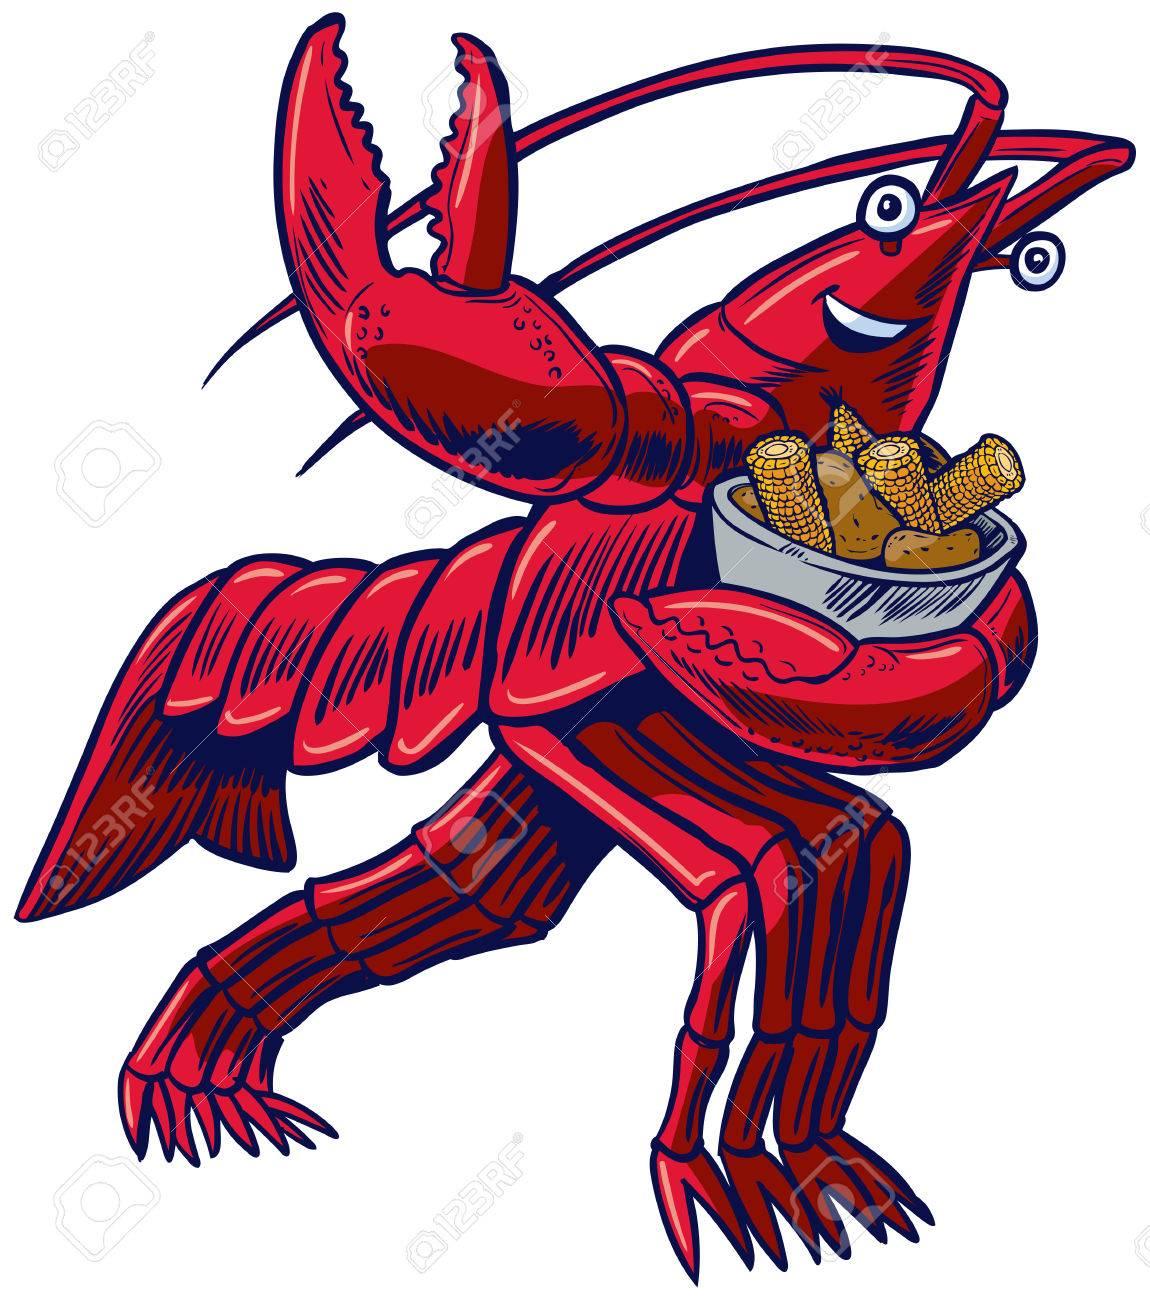 37 Crawfish free clipart.